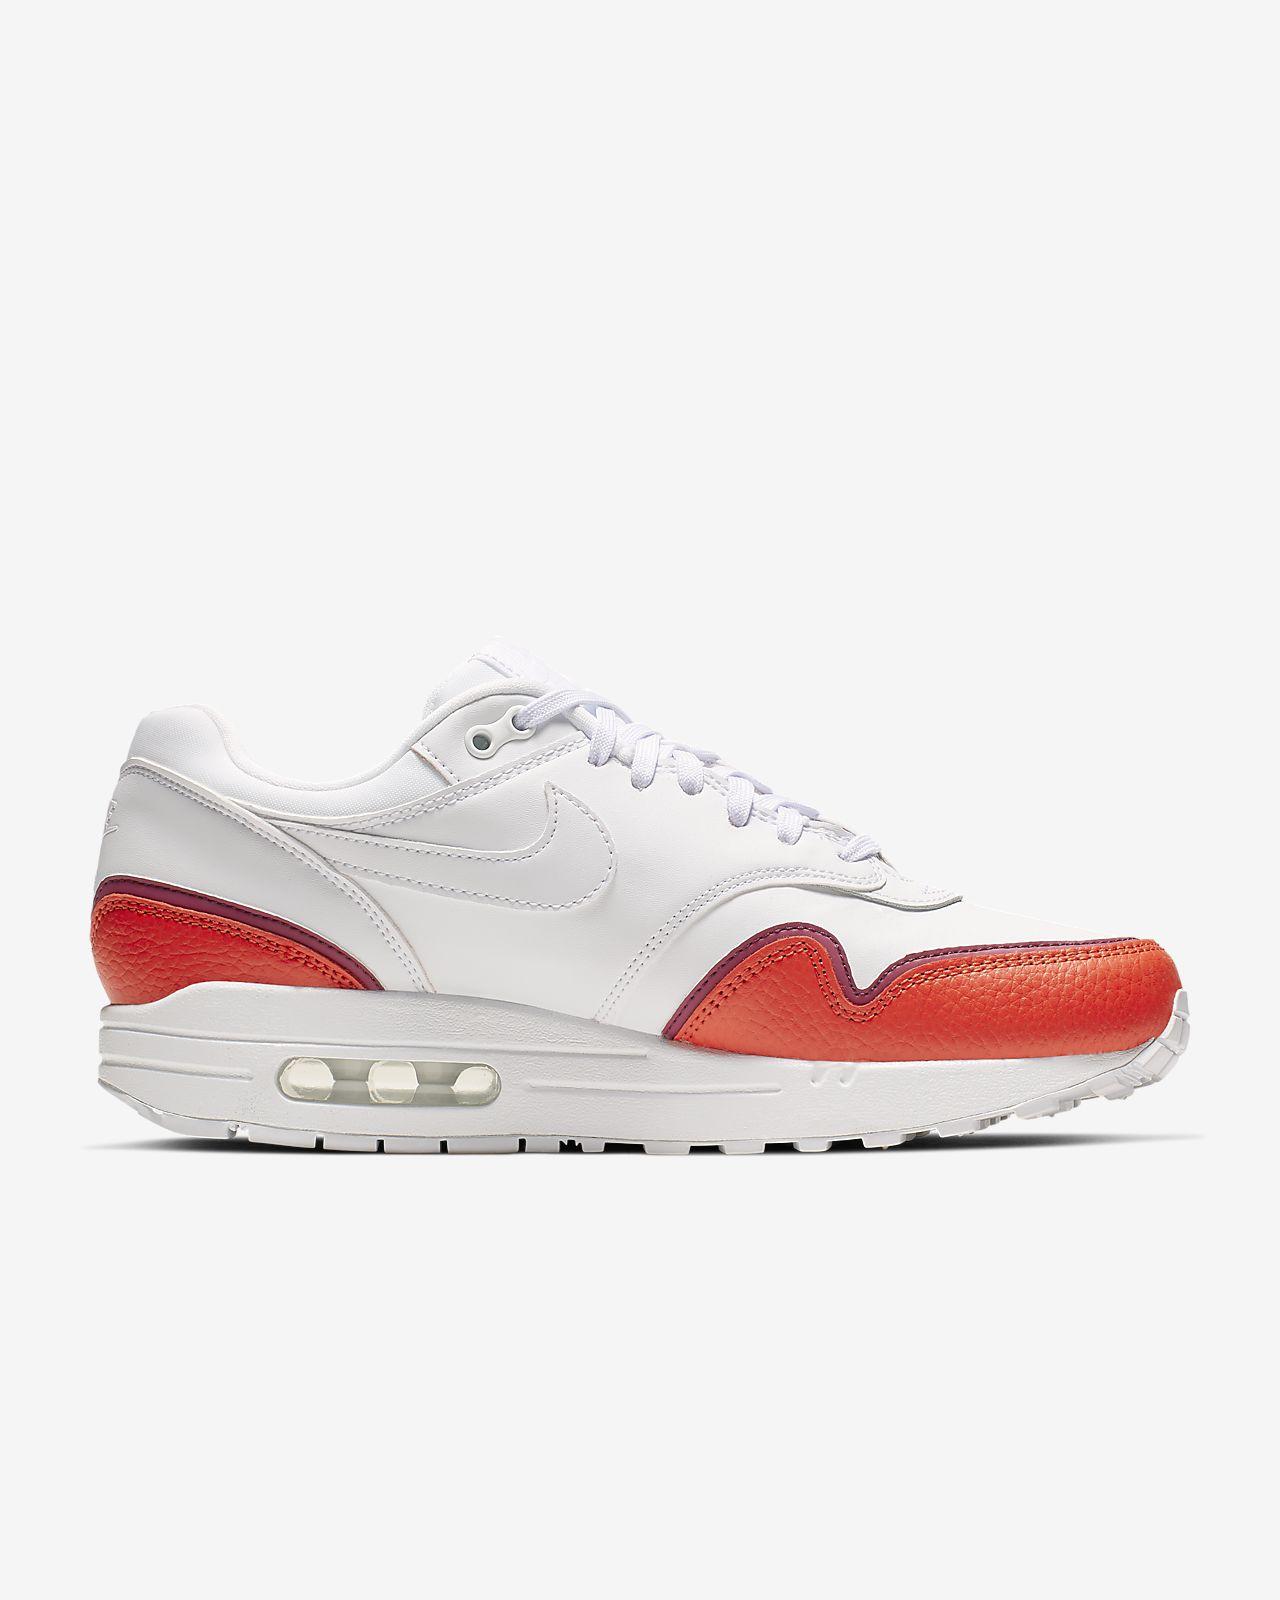 0bbe8df0ae Nike Air Max 1 SE Women's Shoe. Nike.com CA